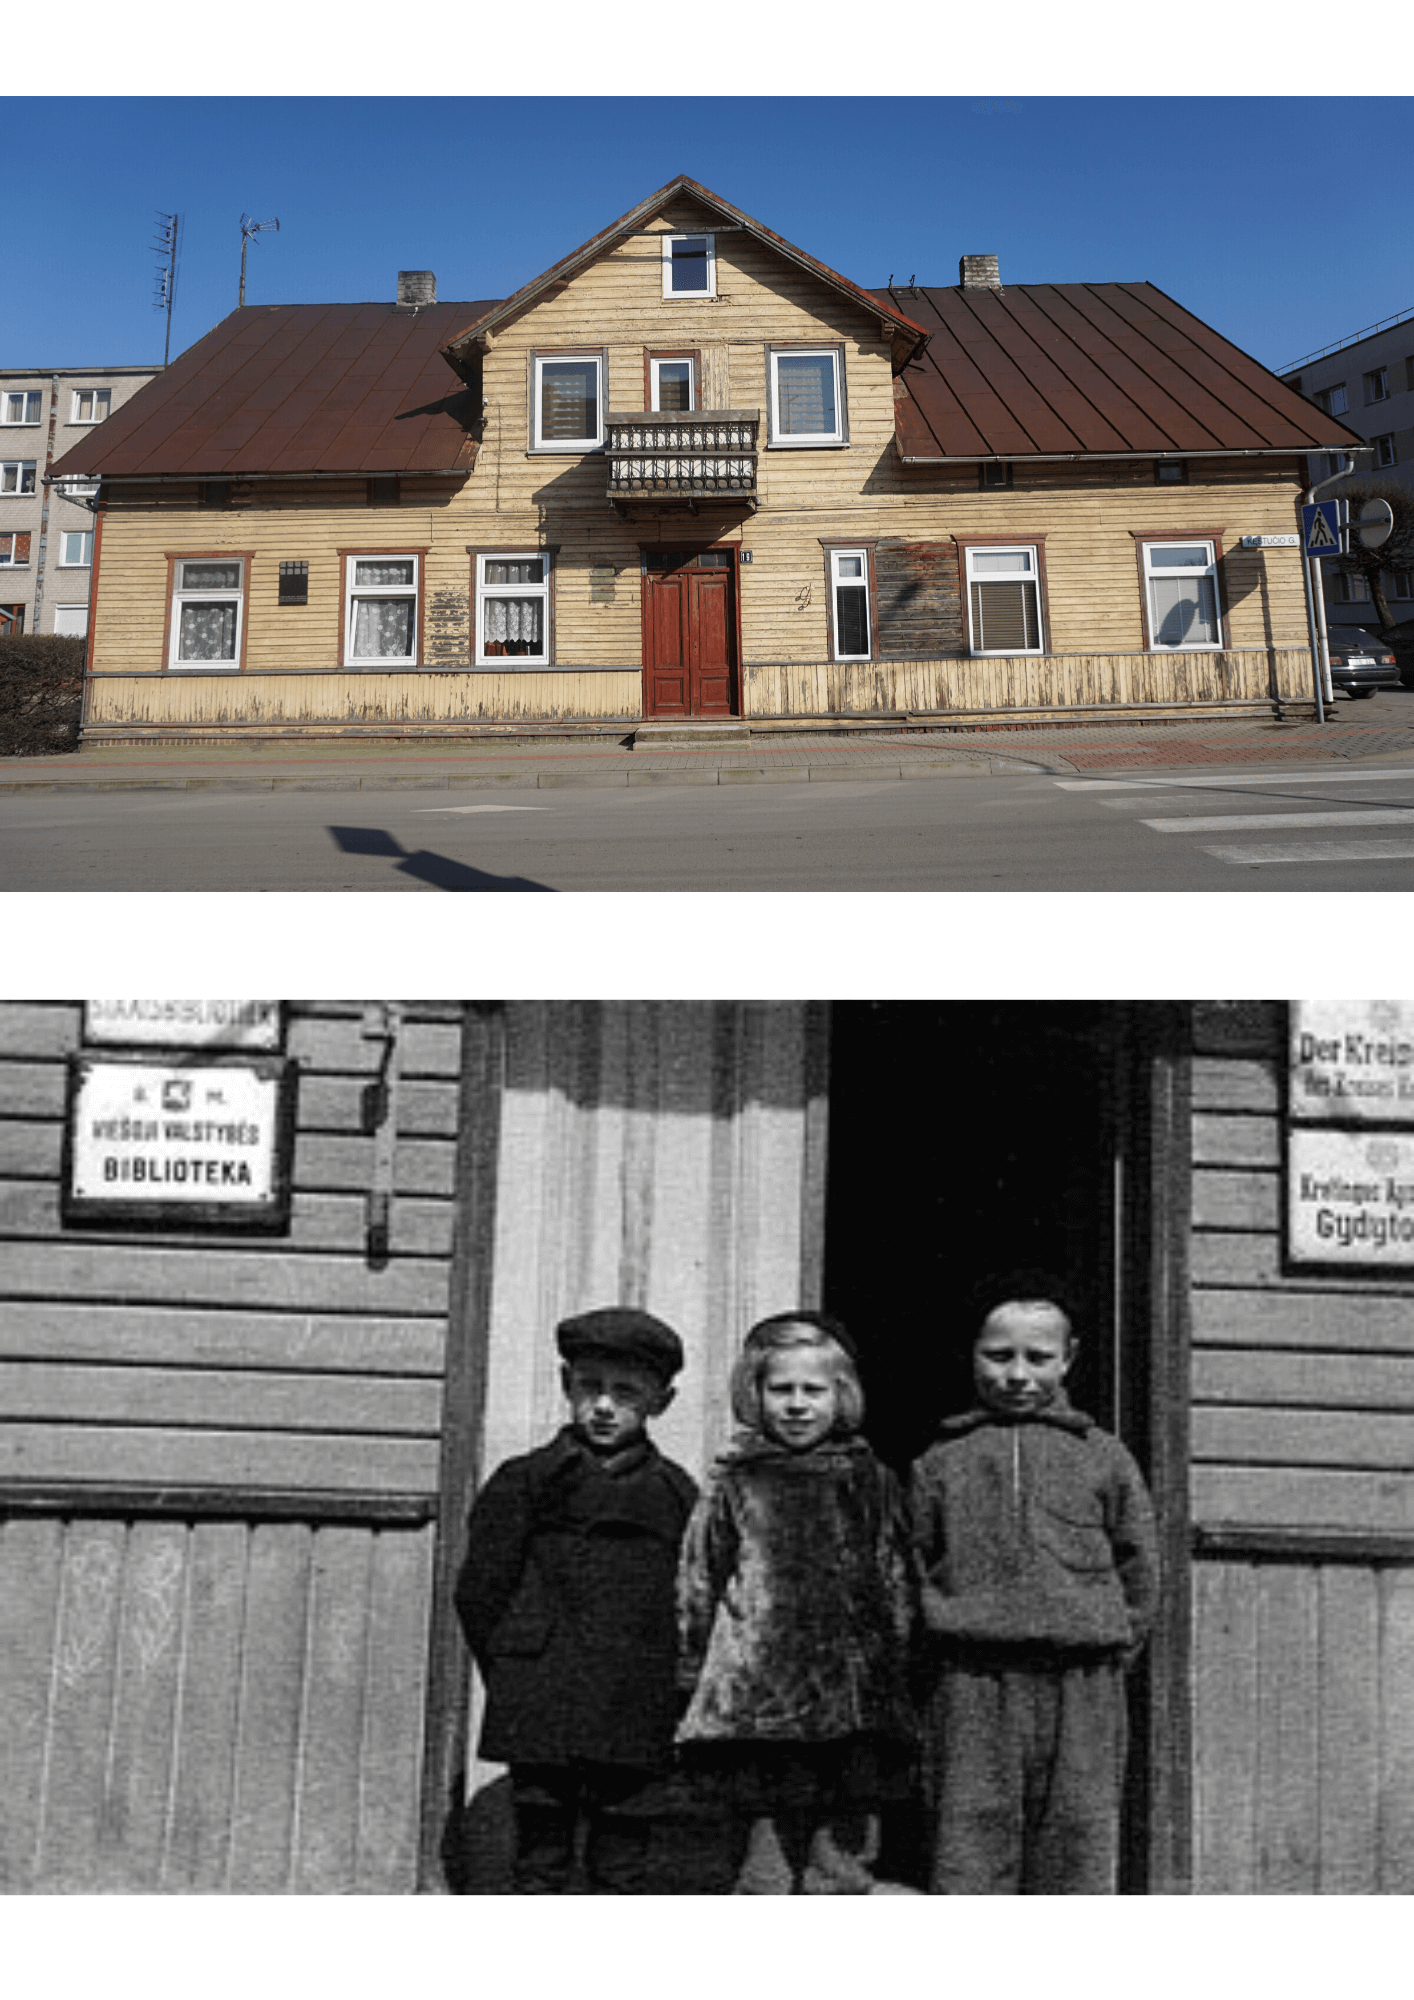 Kretingos viešosios bibliotekos Kęstučio g. 19